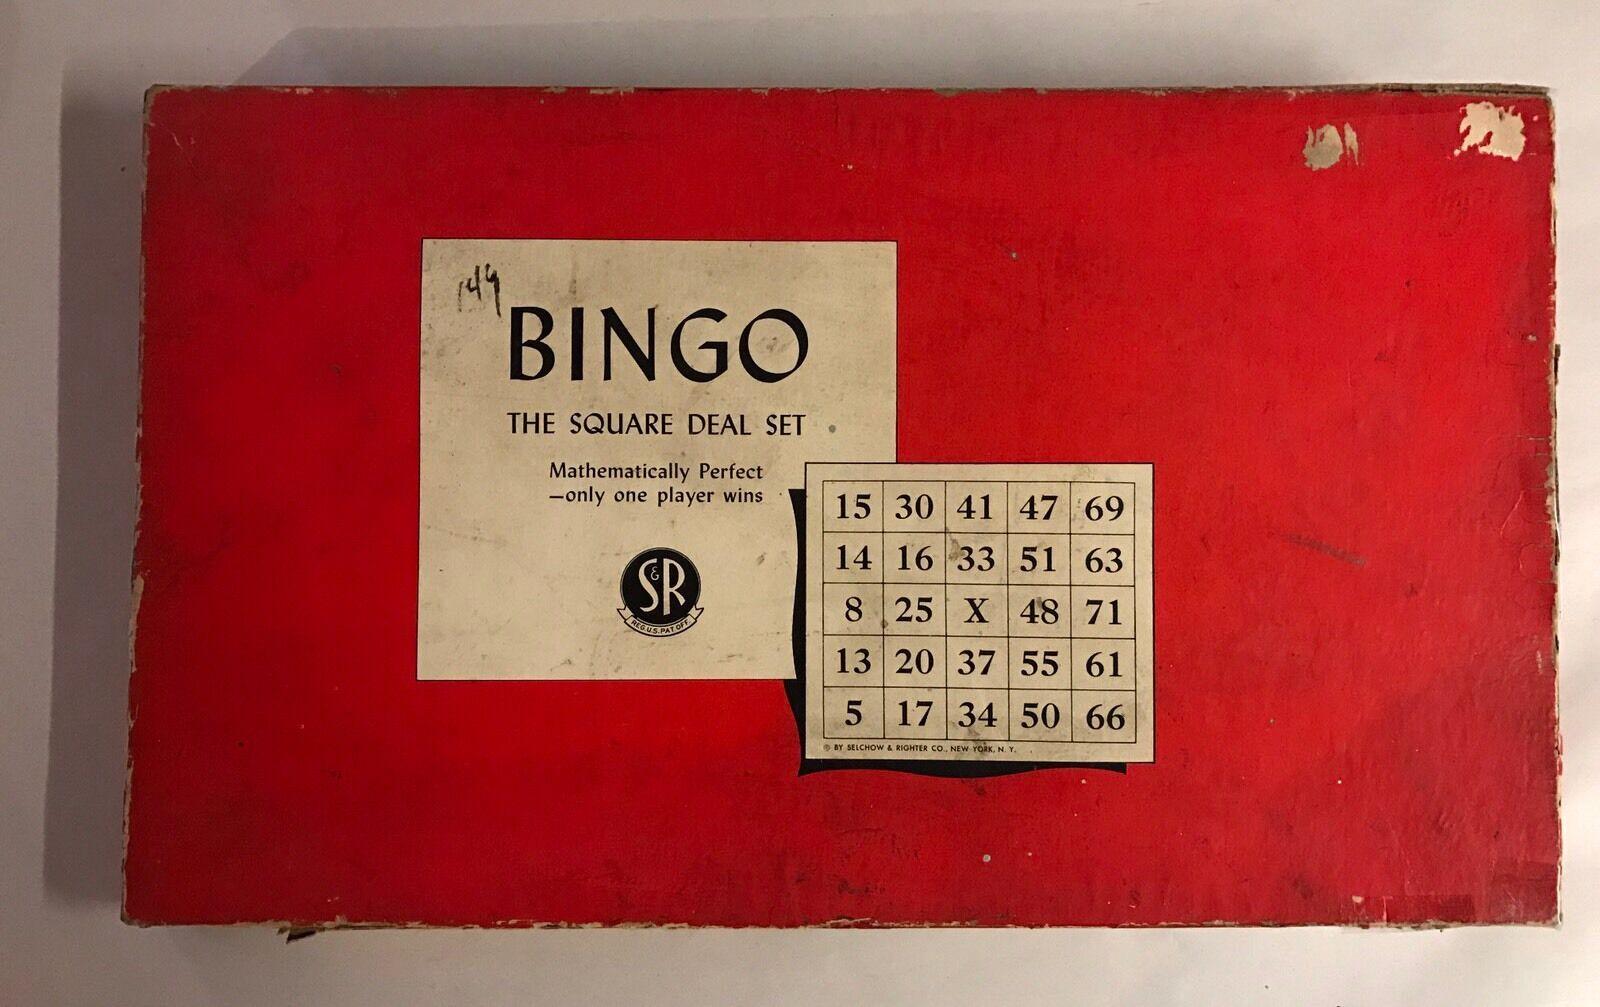 Jahrgang 1936 selchow rechter bingo spiel abgemacht hat karten markierungen, usa